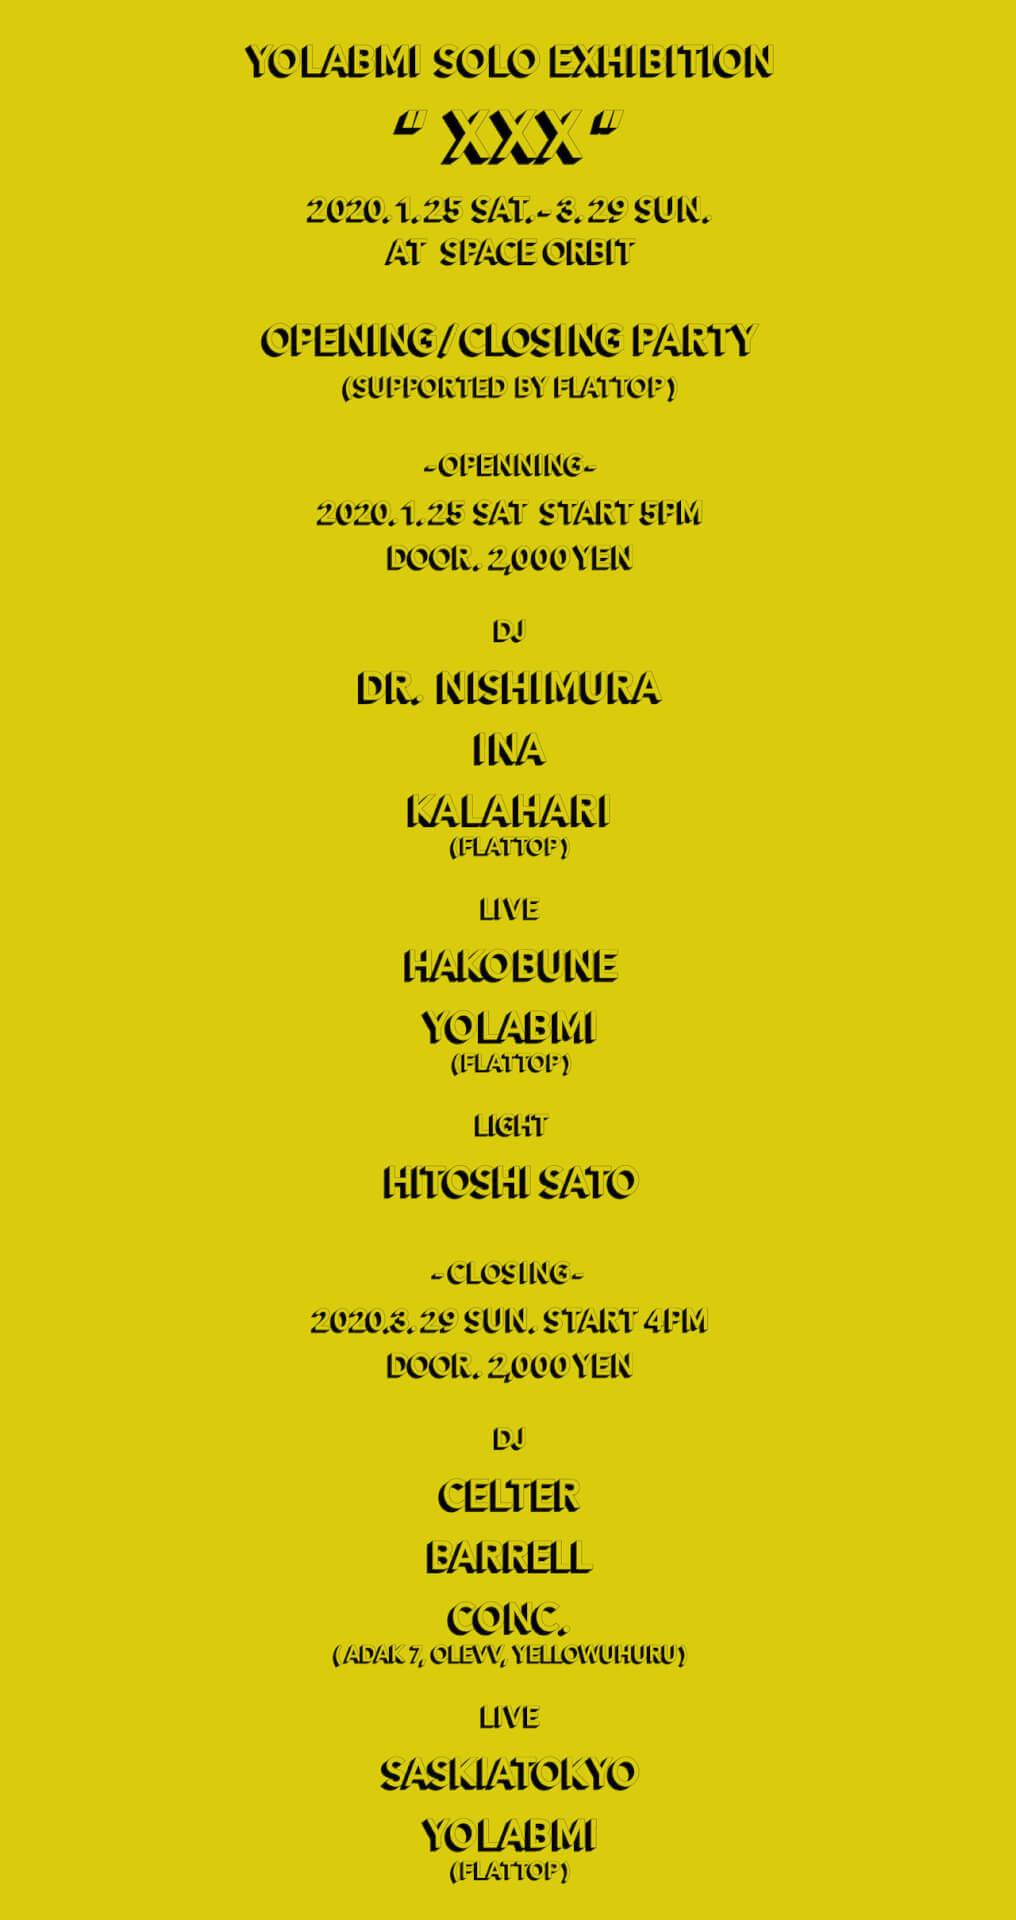 yolabmiが初のコラージュ個展「xxx」を開催|オープニング&クロージングパーティーにはDr.Nishimuraらが登場 music200123-yolabmi-xxx-2